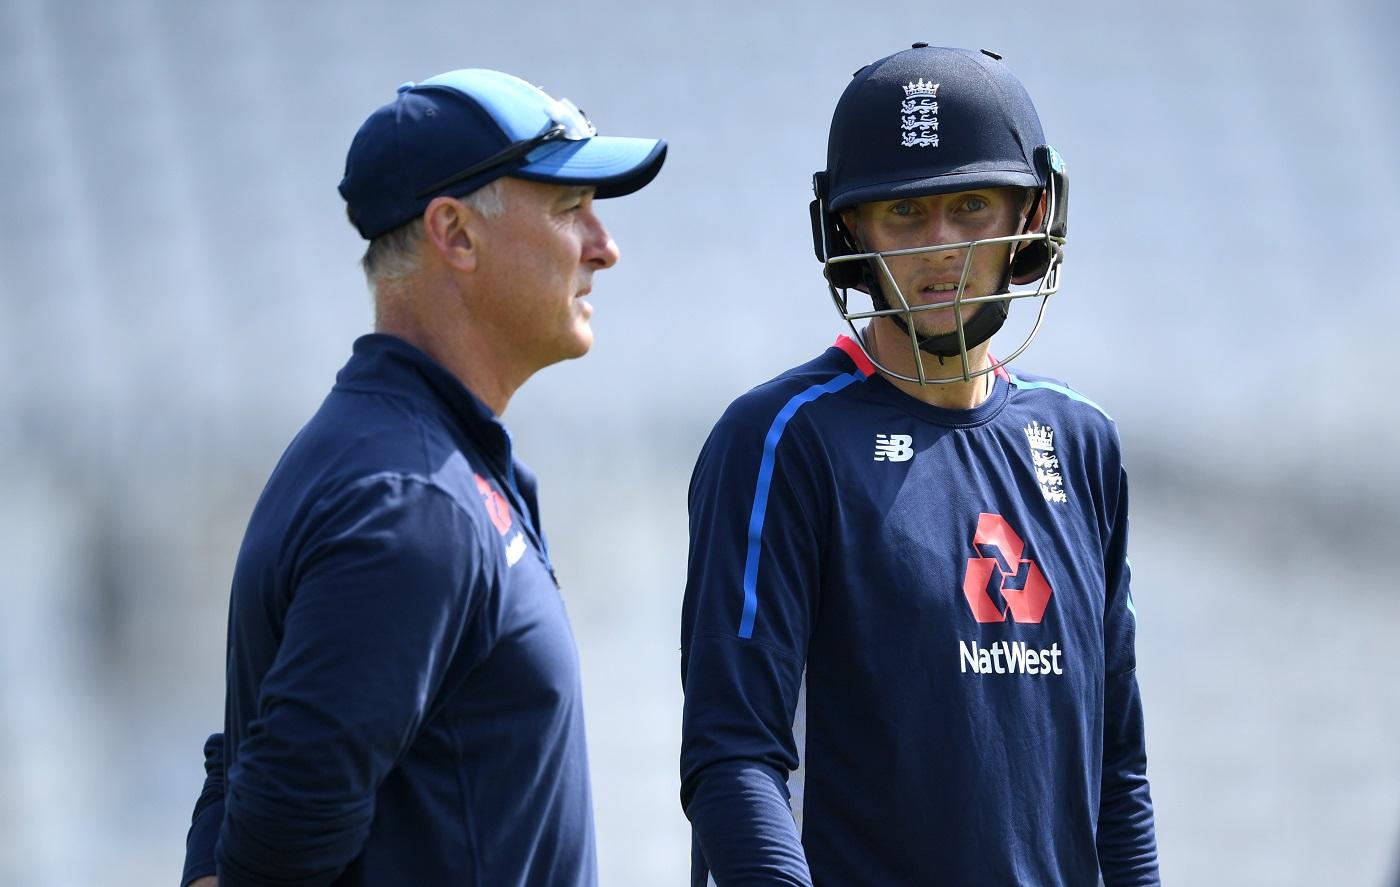 IND vs ENG 2018: Kuldeep Yadav Shut Us Down, Says England Batting Coach Graham Thorpe